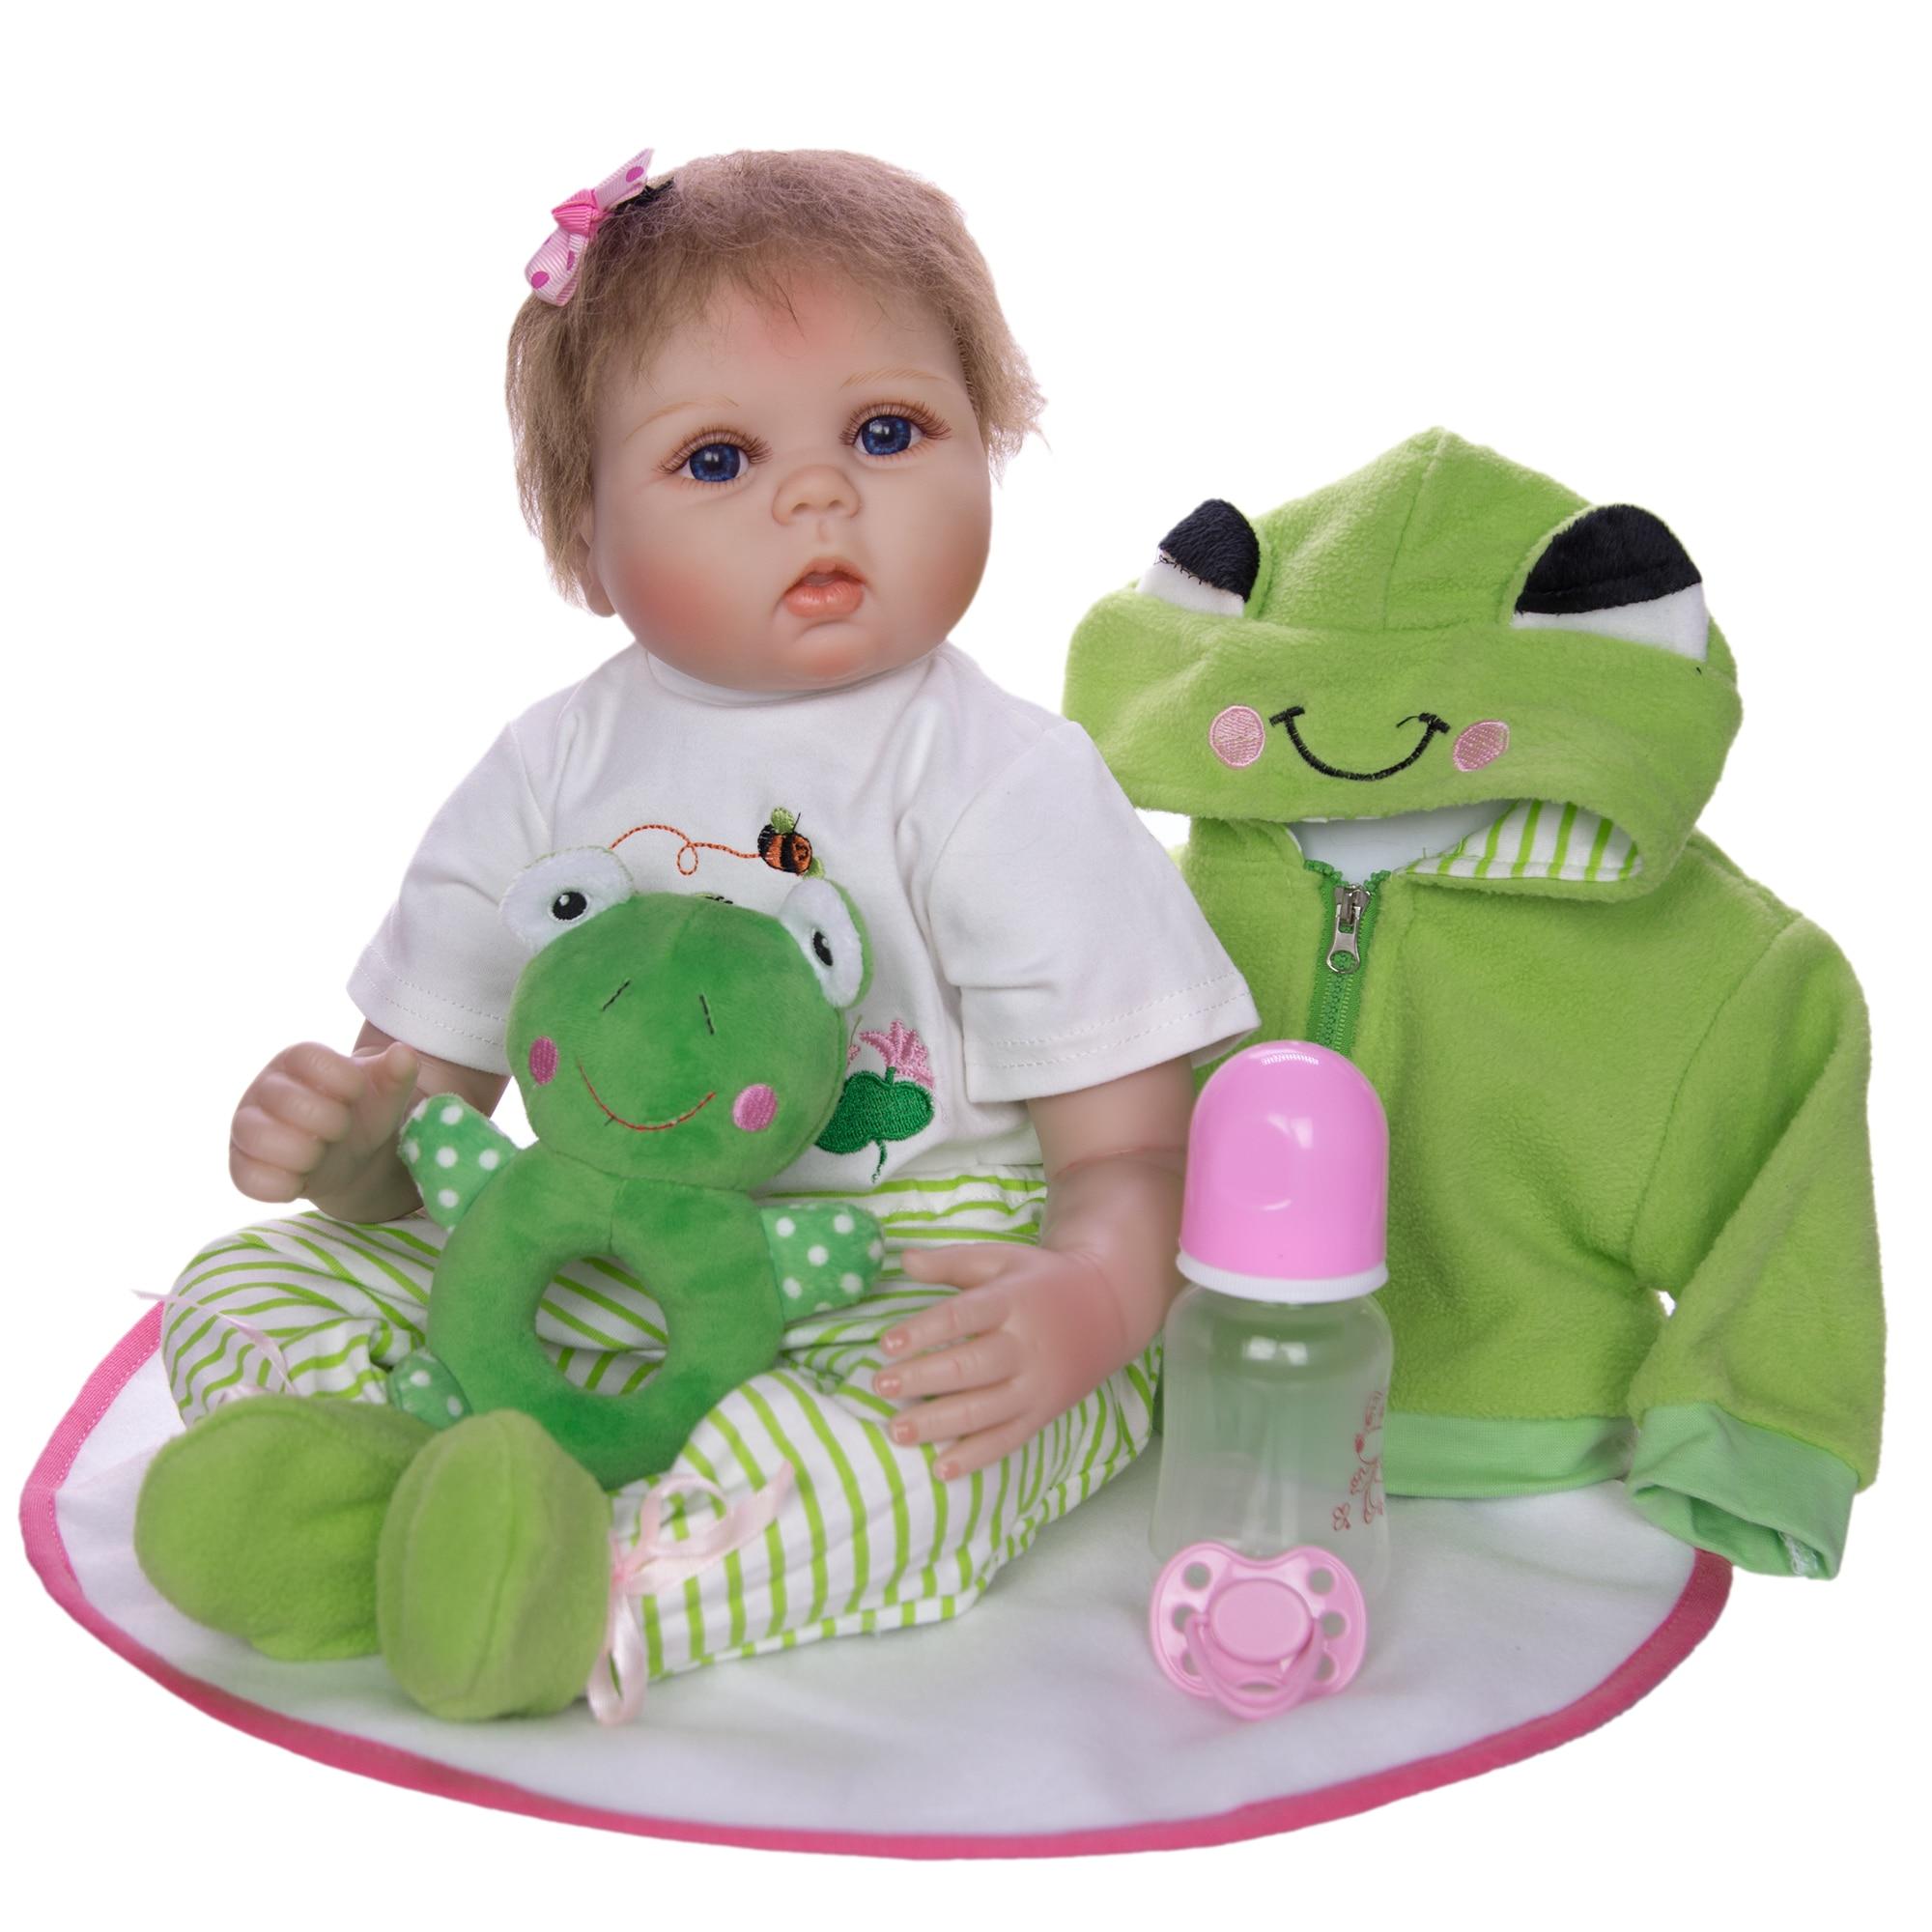 KEIUMI Design Soft Silicone Doll Reborn Baby 55cm Toy For Reborn Boneca Doll Girl Birthday Gift